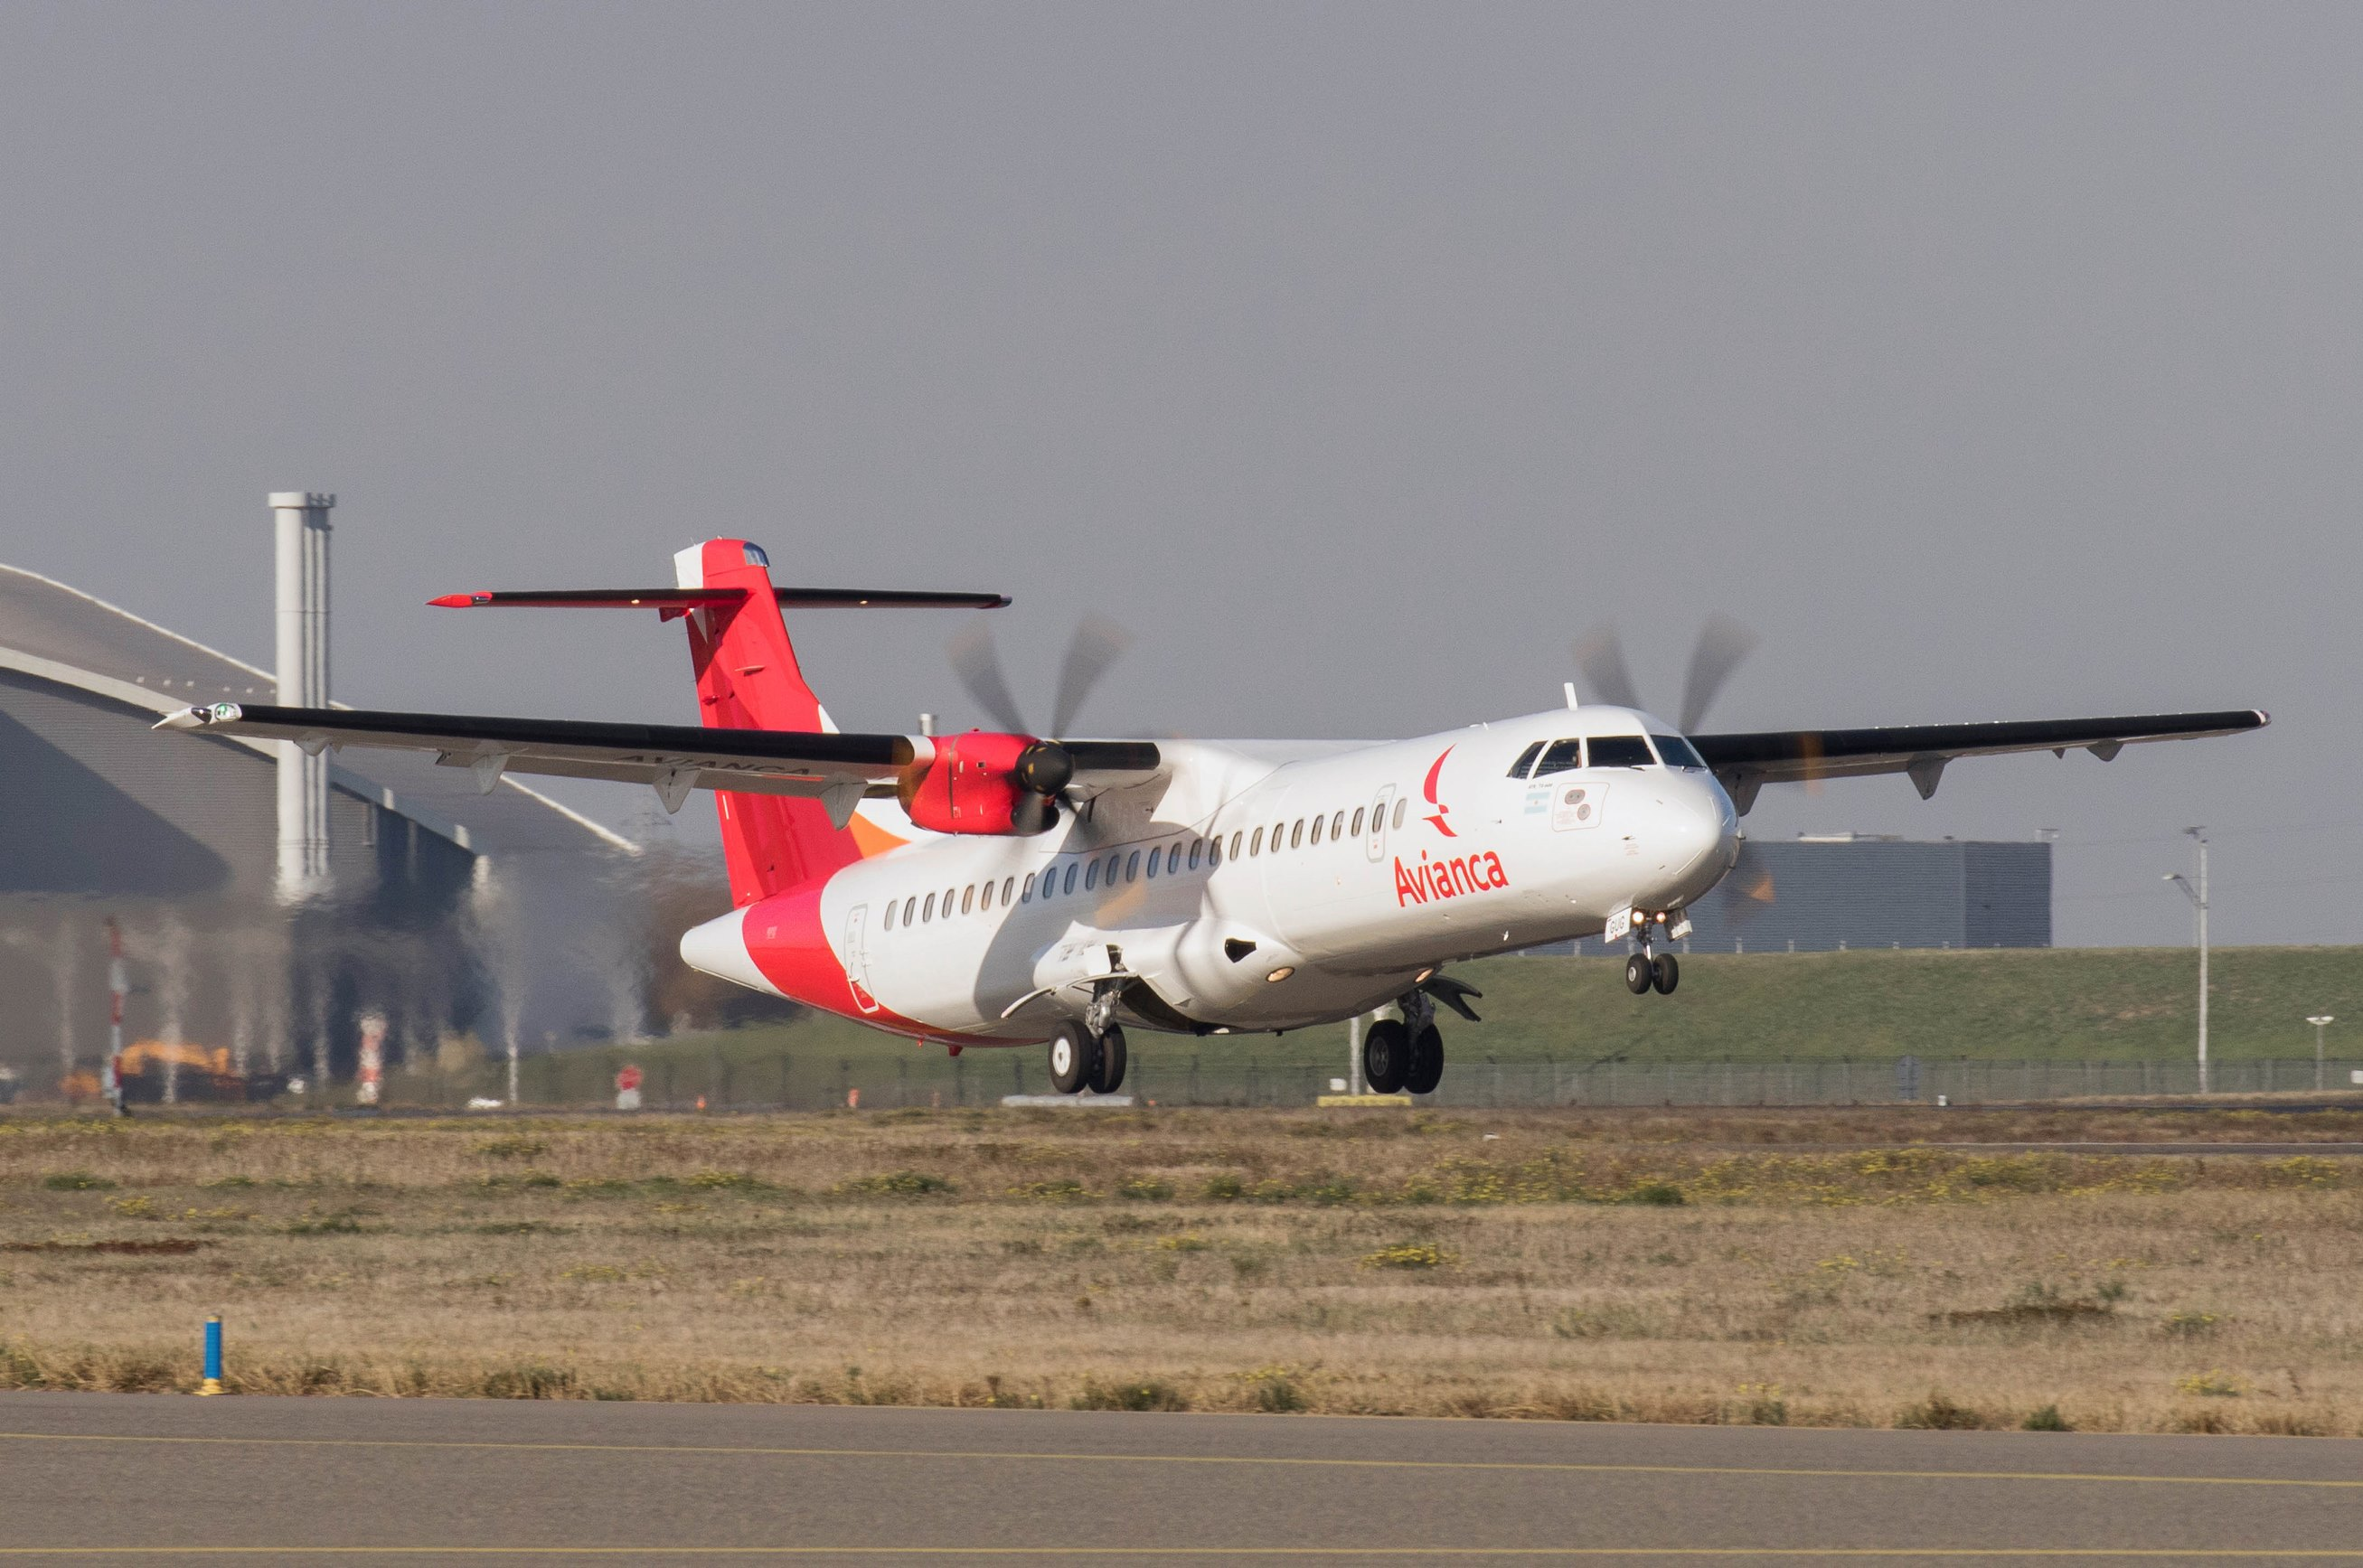 ATR 72-600 turboprop regional aircraft